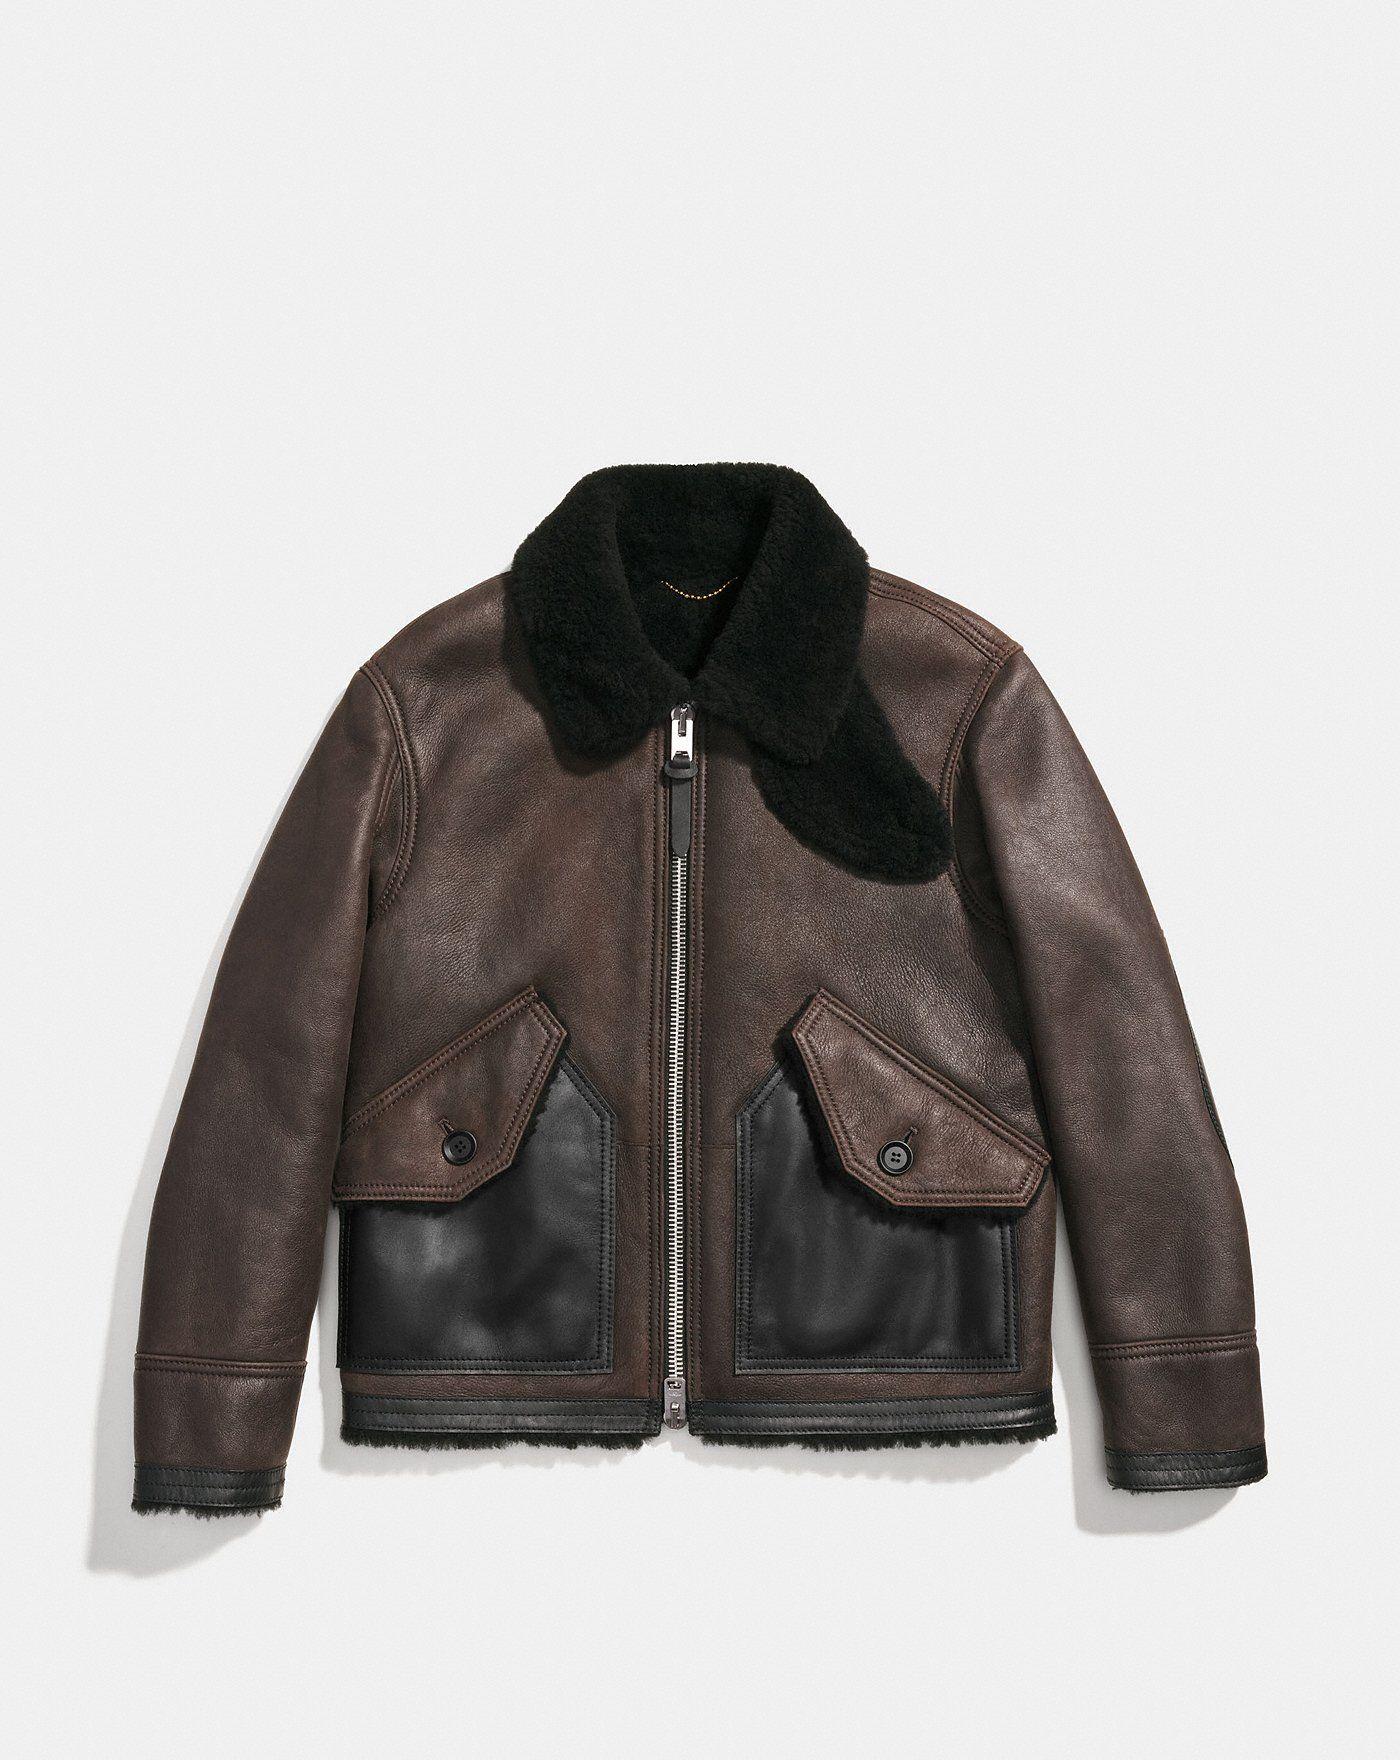 Coach Uk Official Site New York Modern Luxury Brand Est 1941 B3 Bomber Jacket Bomber Jacket Jackets [ 1760 x 1400 Pixel ]